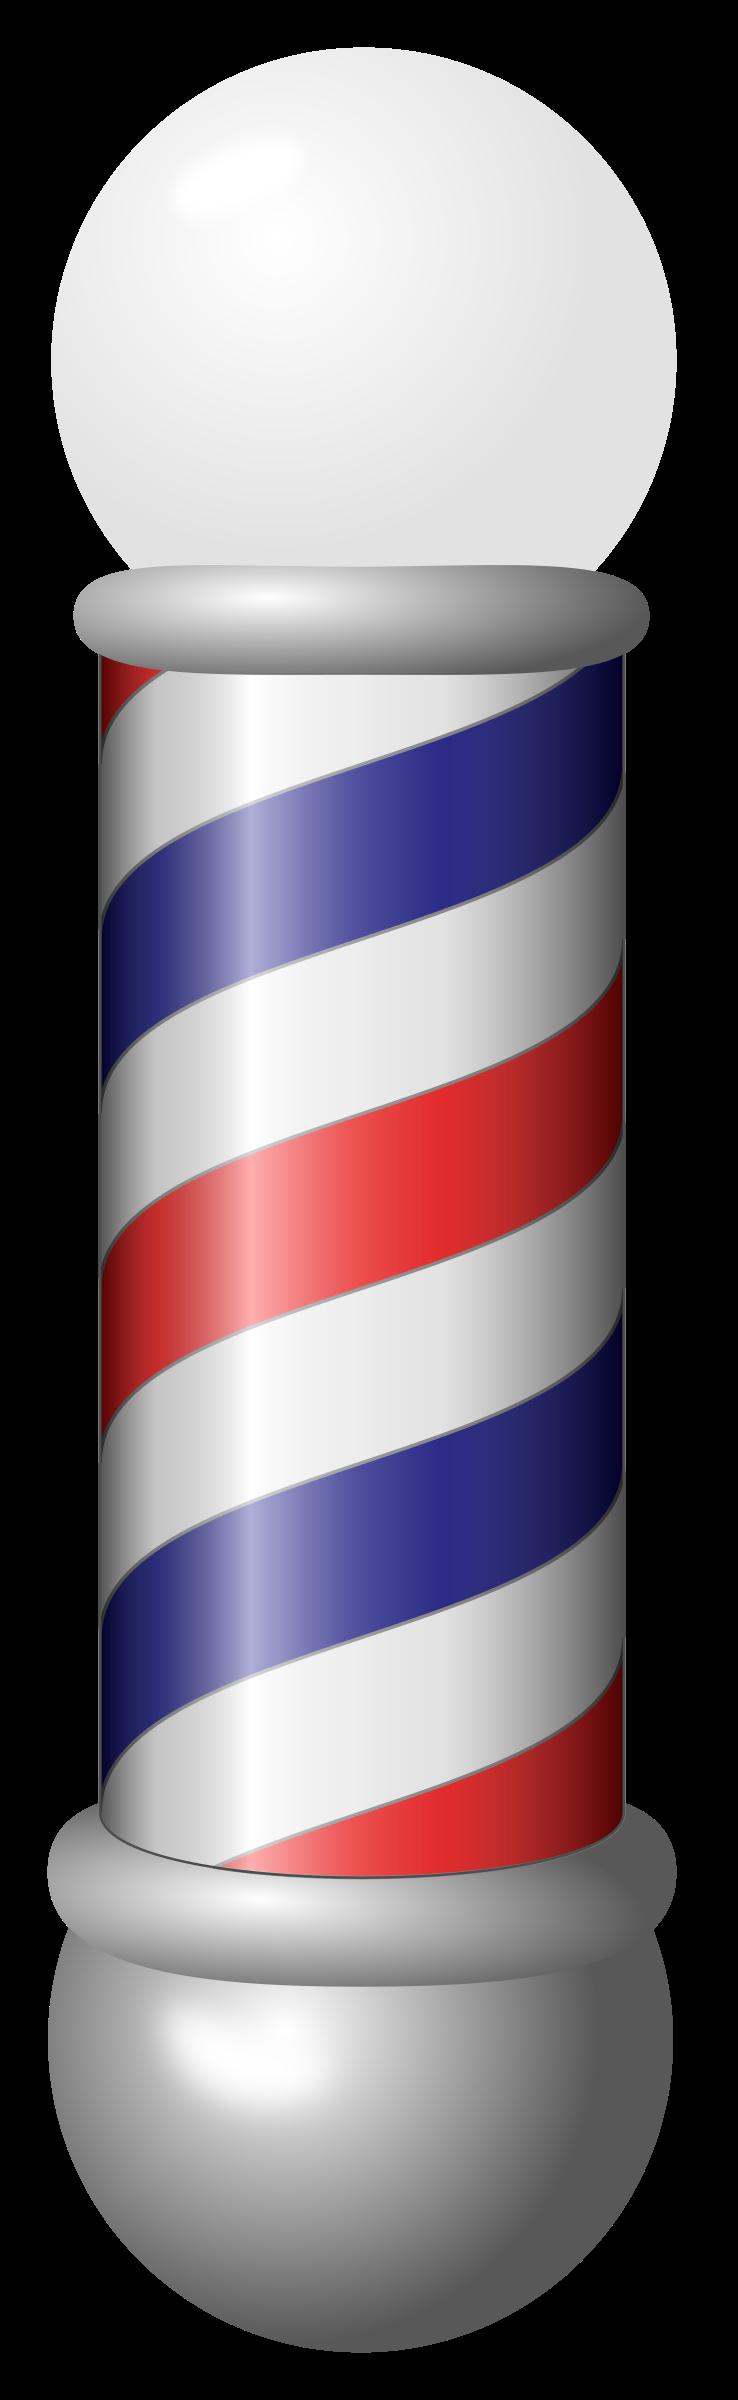 Clipart - Barber Pole - Barber Pole PNG HD - Barber PNG HD